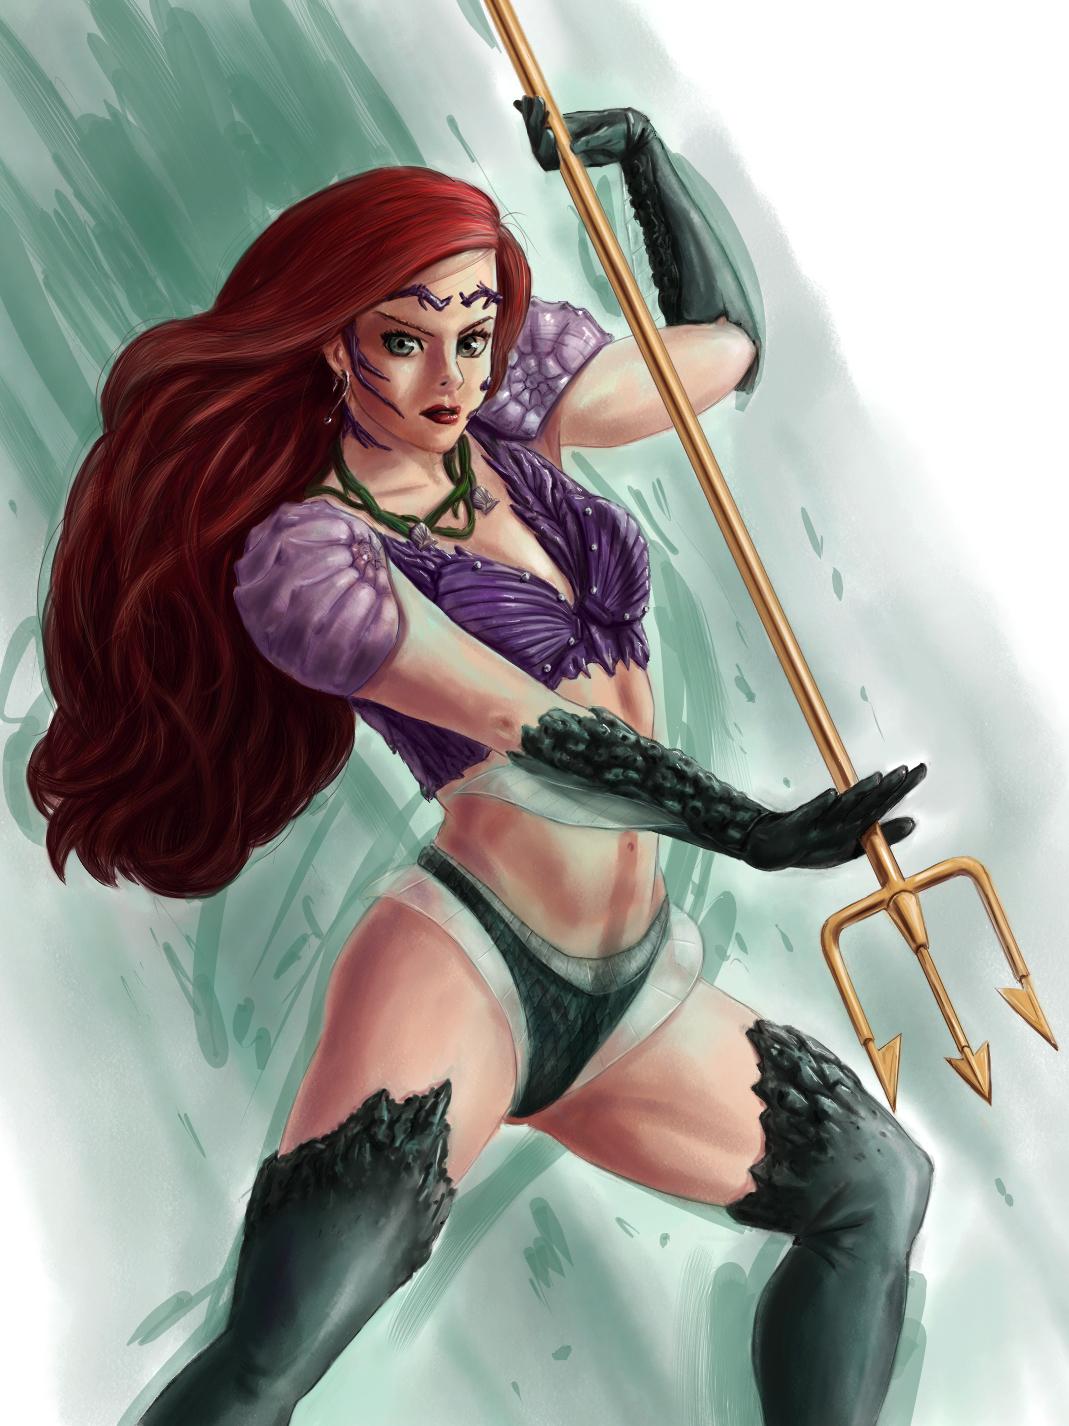 Disney Fighter - Ariel by joshwmc